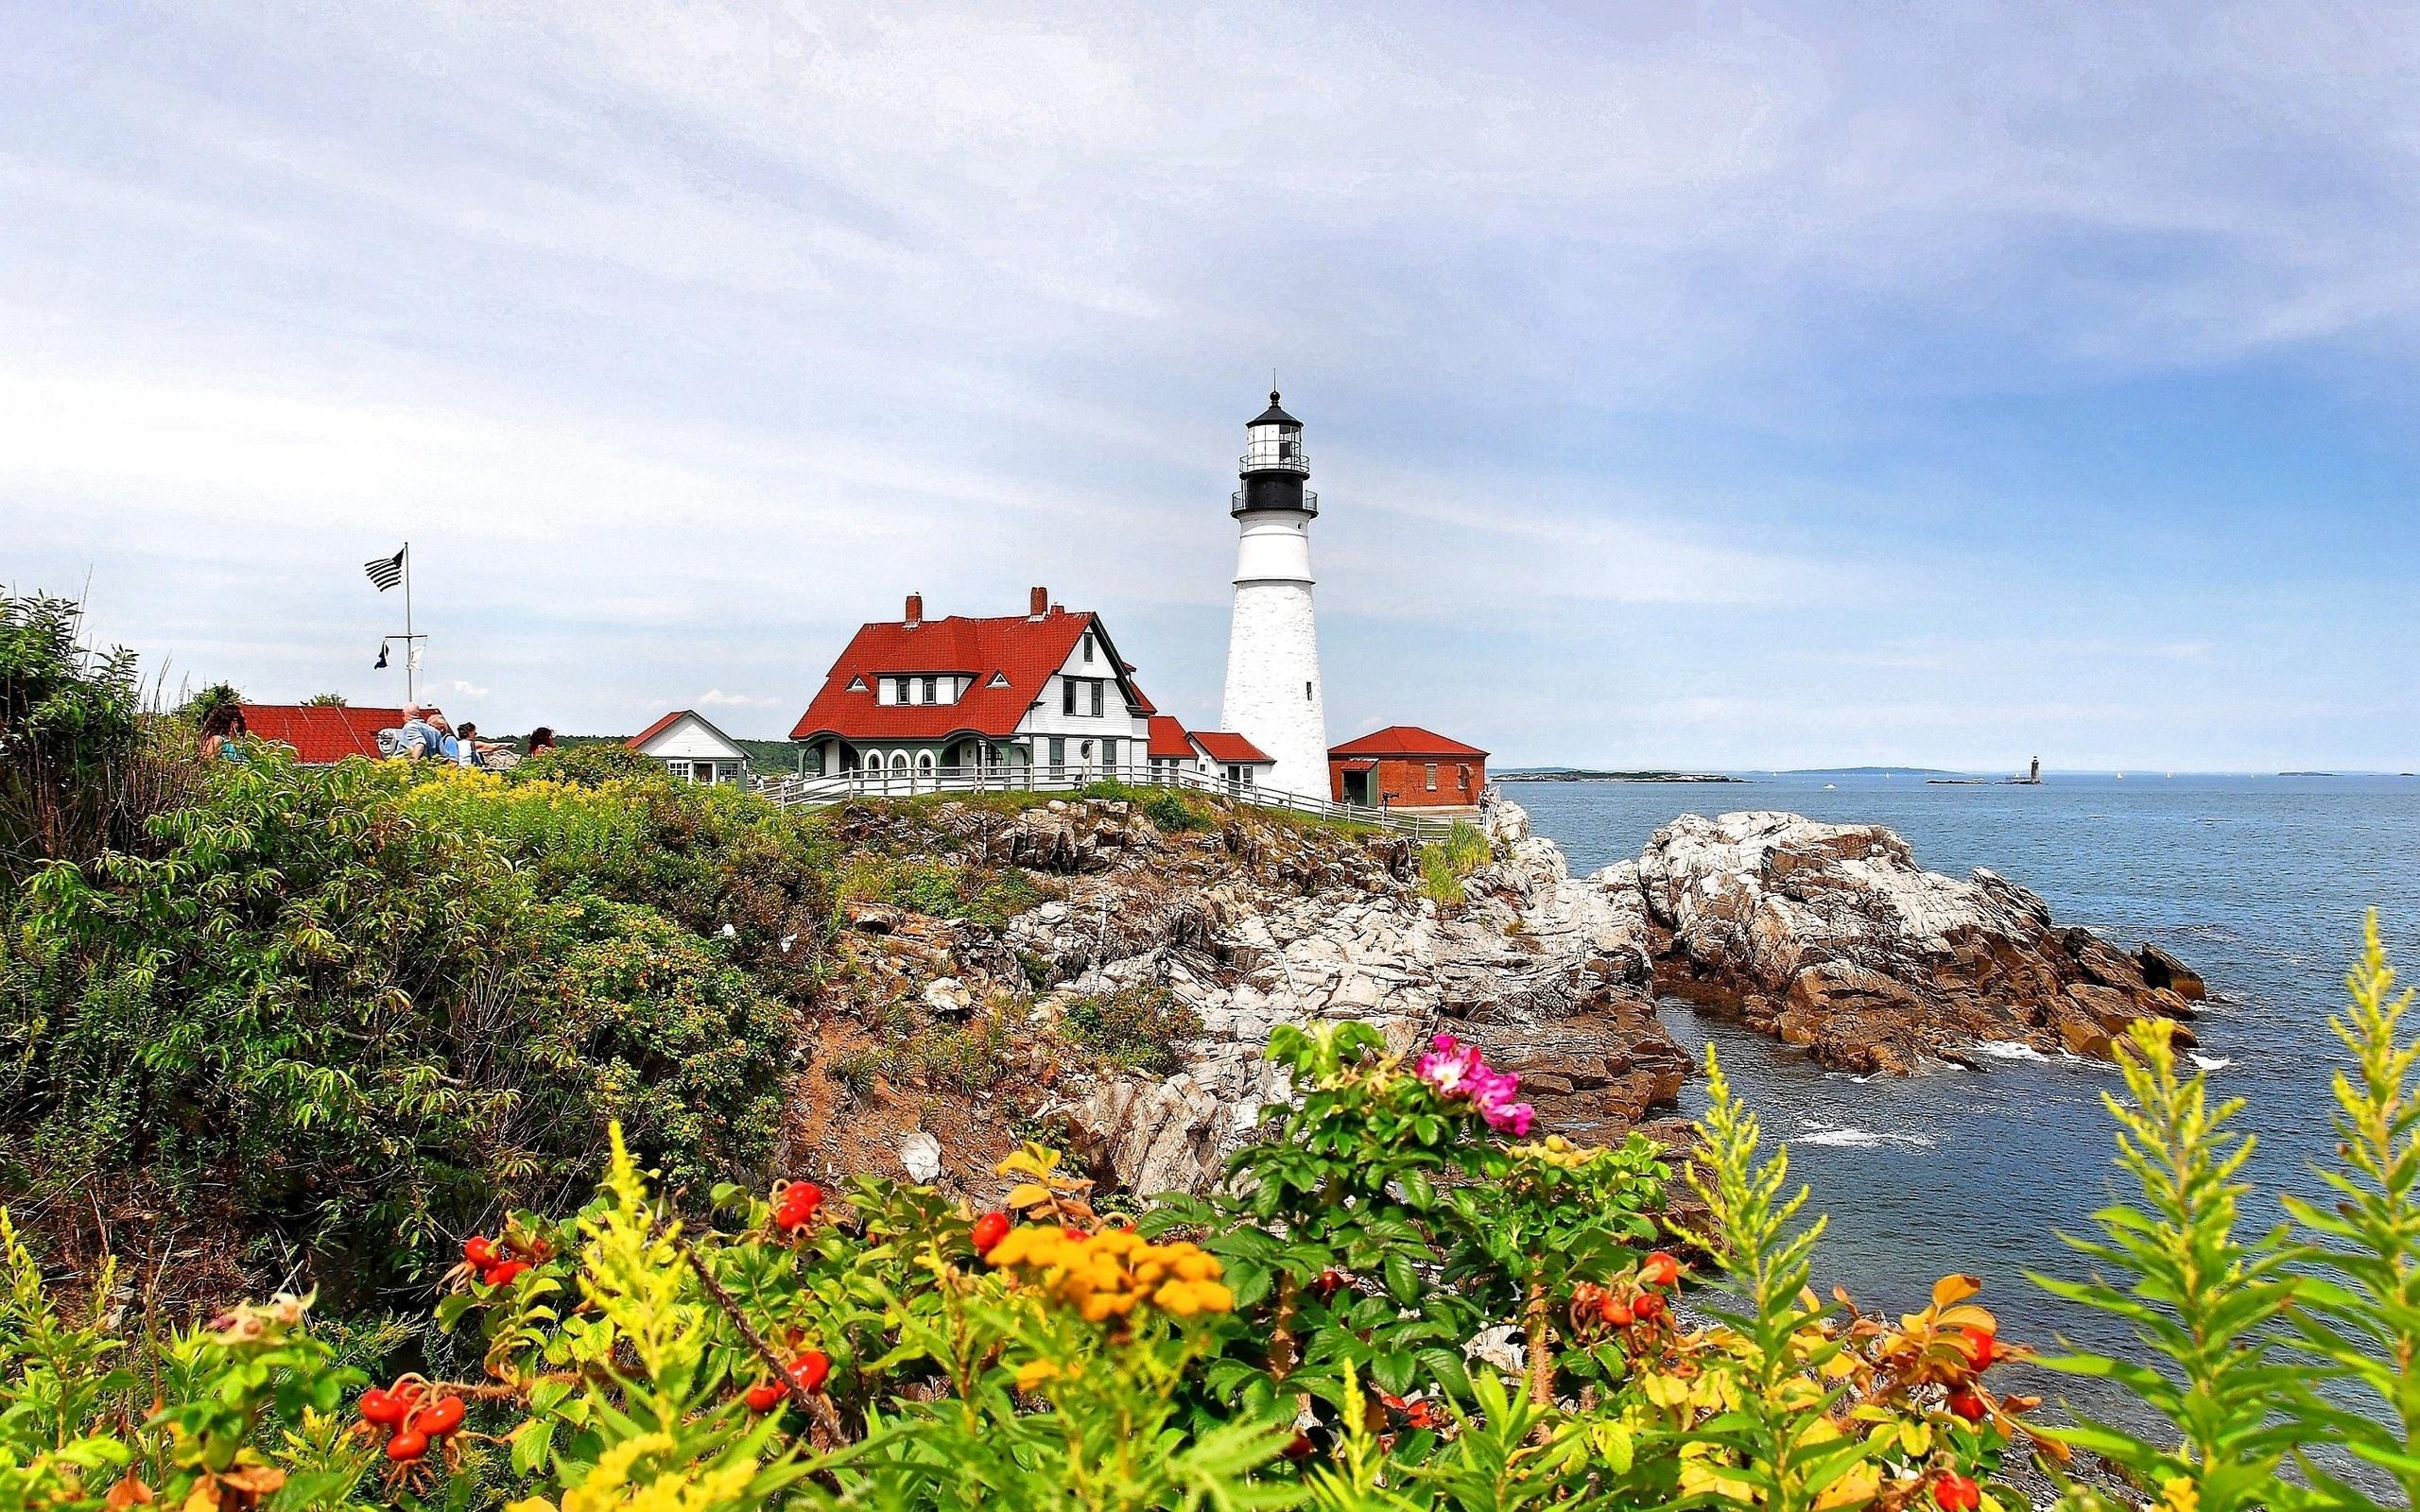 Fall Coastal Desktop Wallpaper Lighthouse Hd Wallpaper Background Image 2560x1600